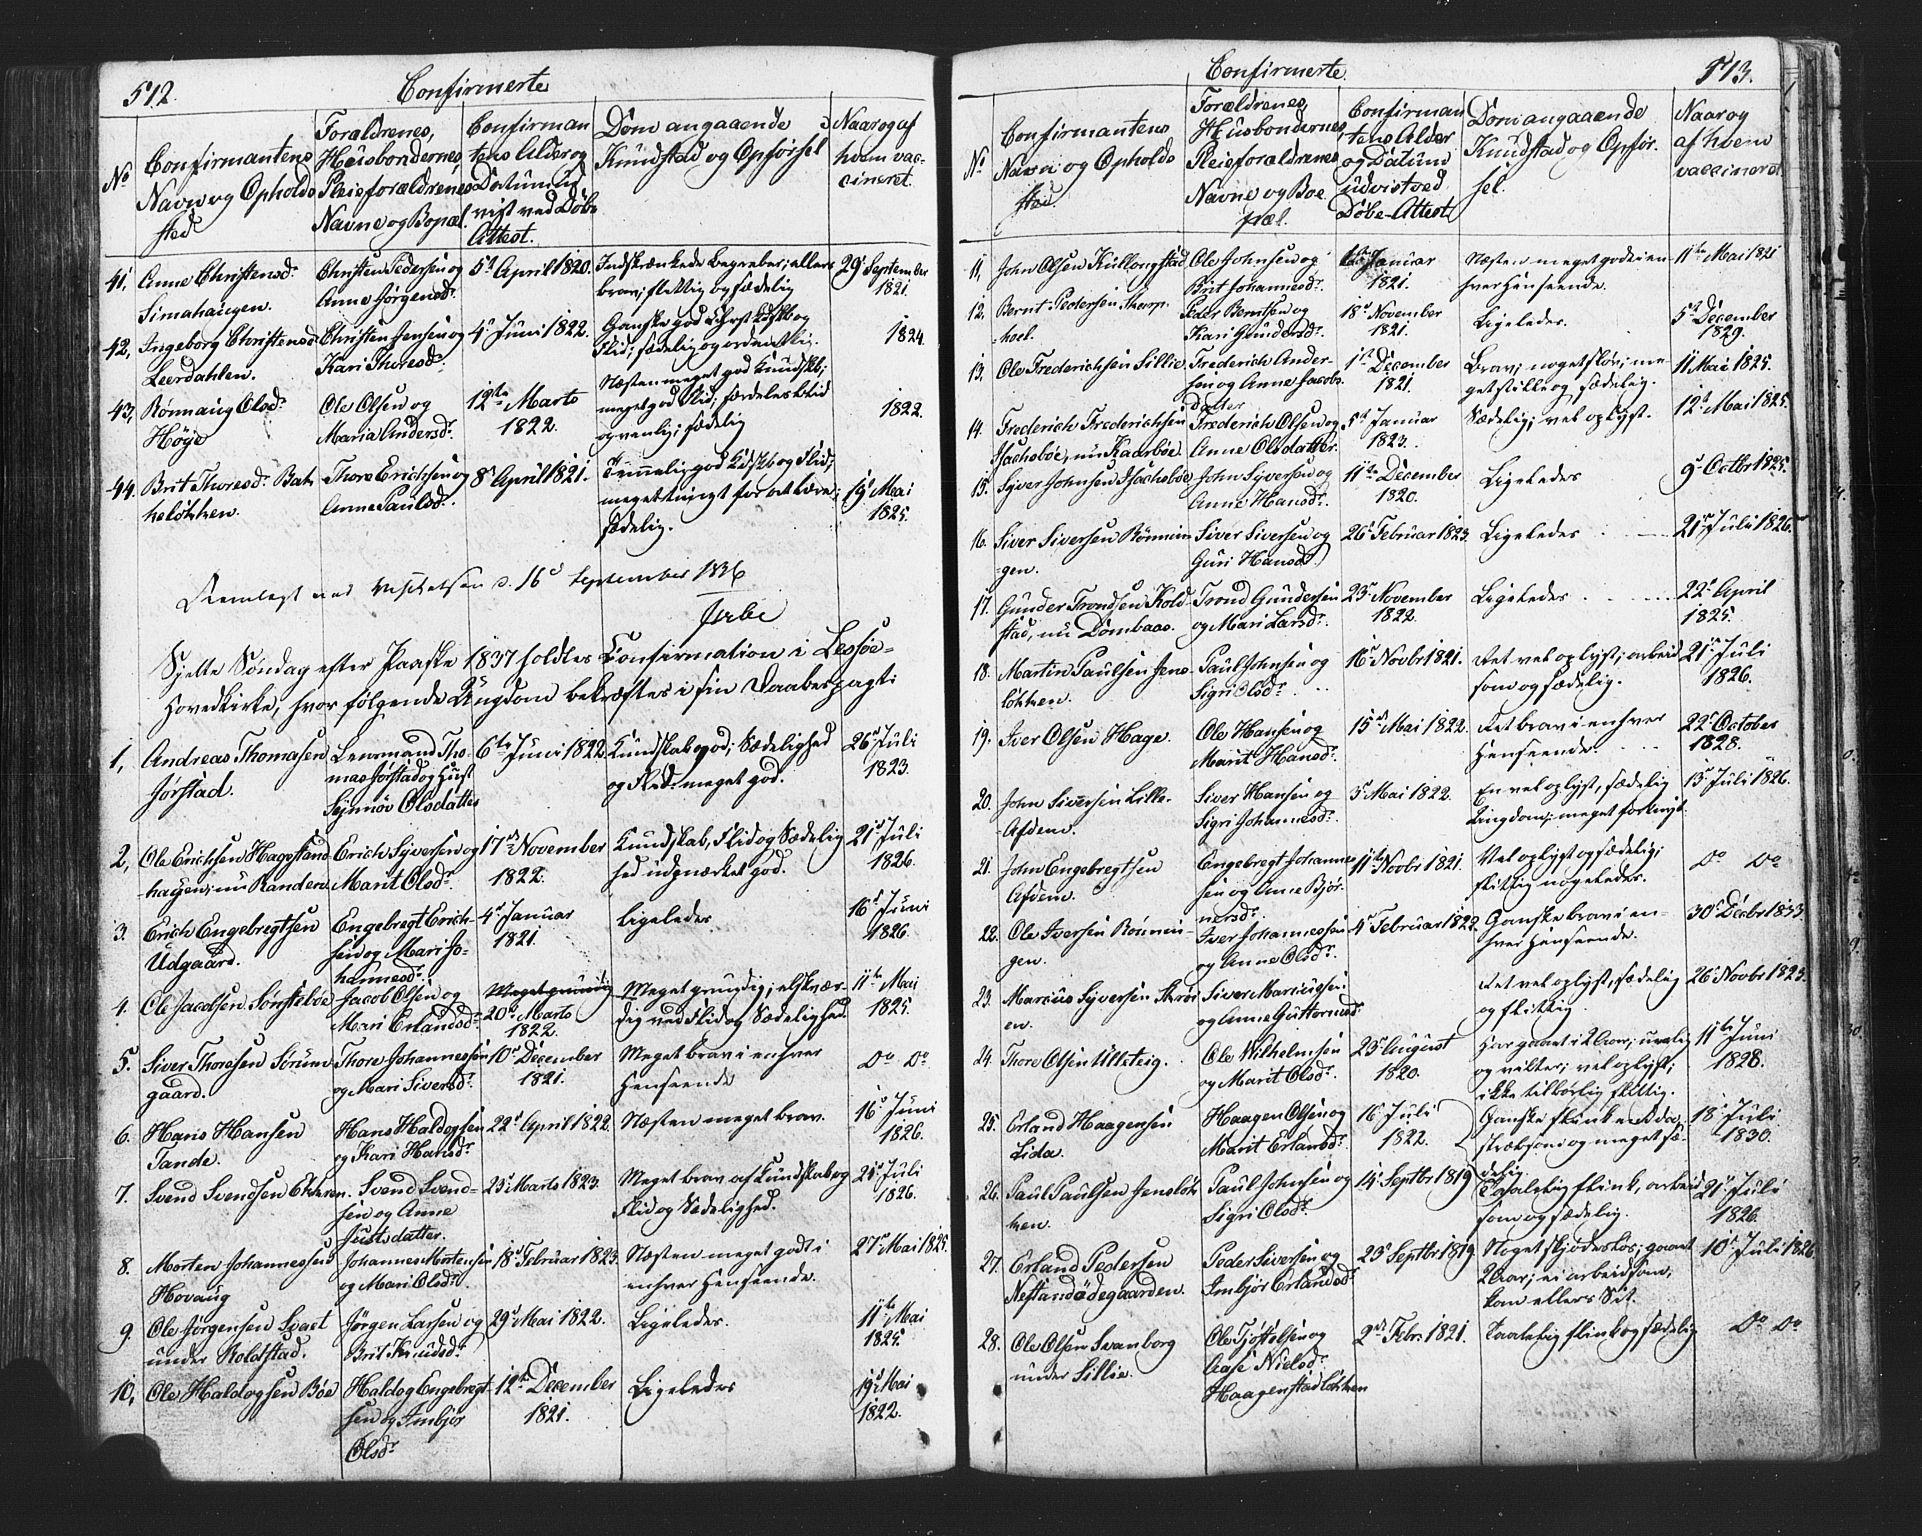 SAH, Lesja prestekontor, Klokkerbok nr. 2, 1832-1850, s. 512-513